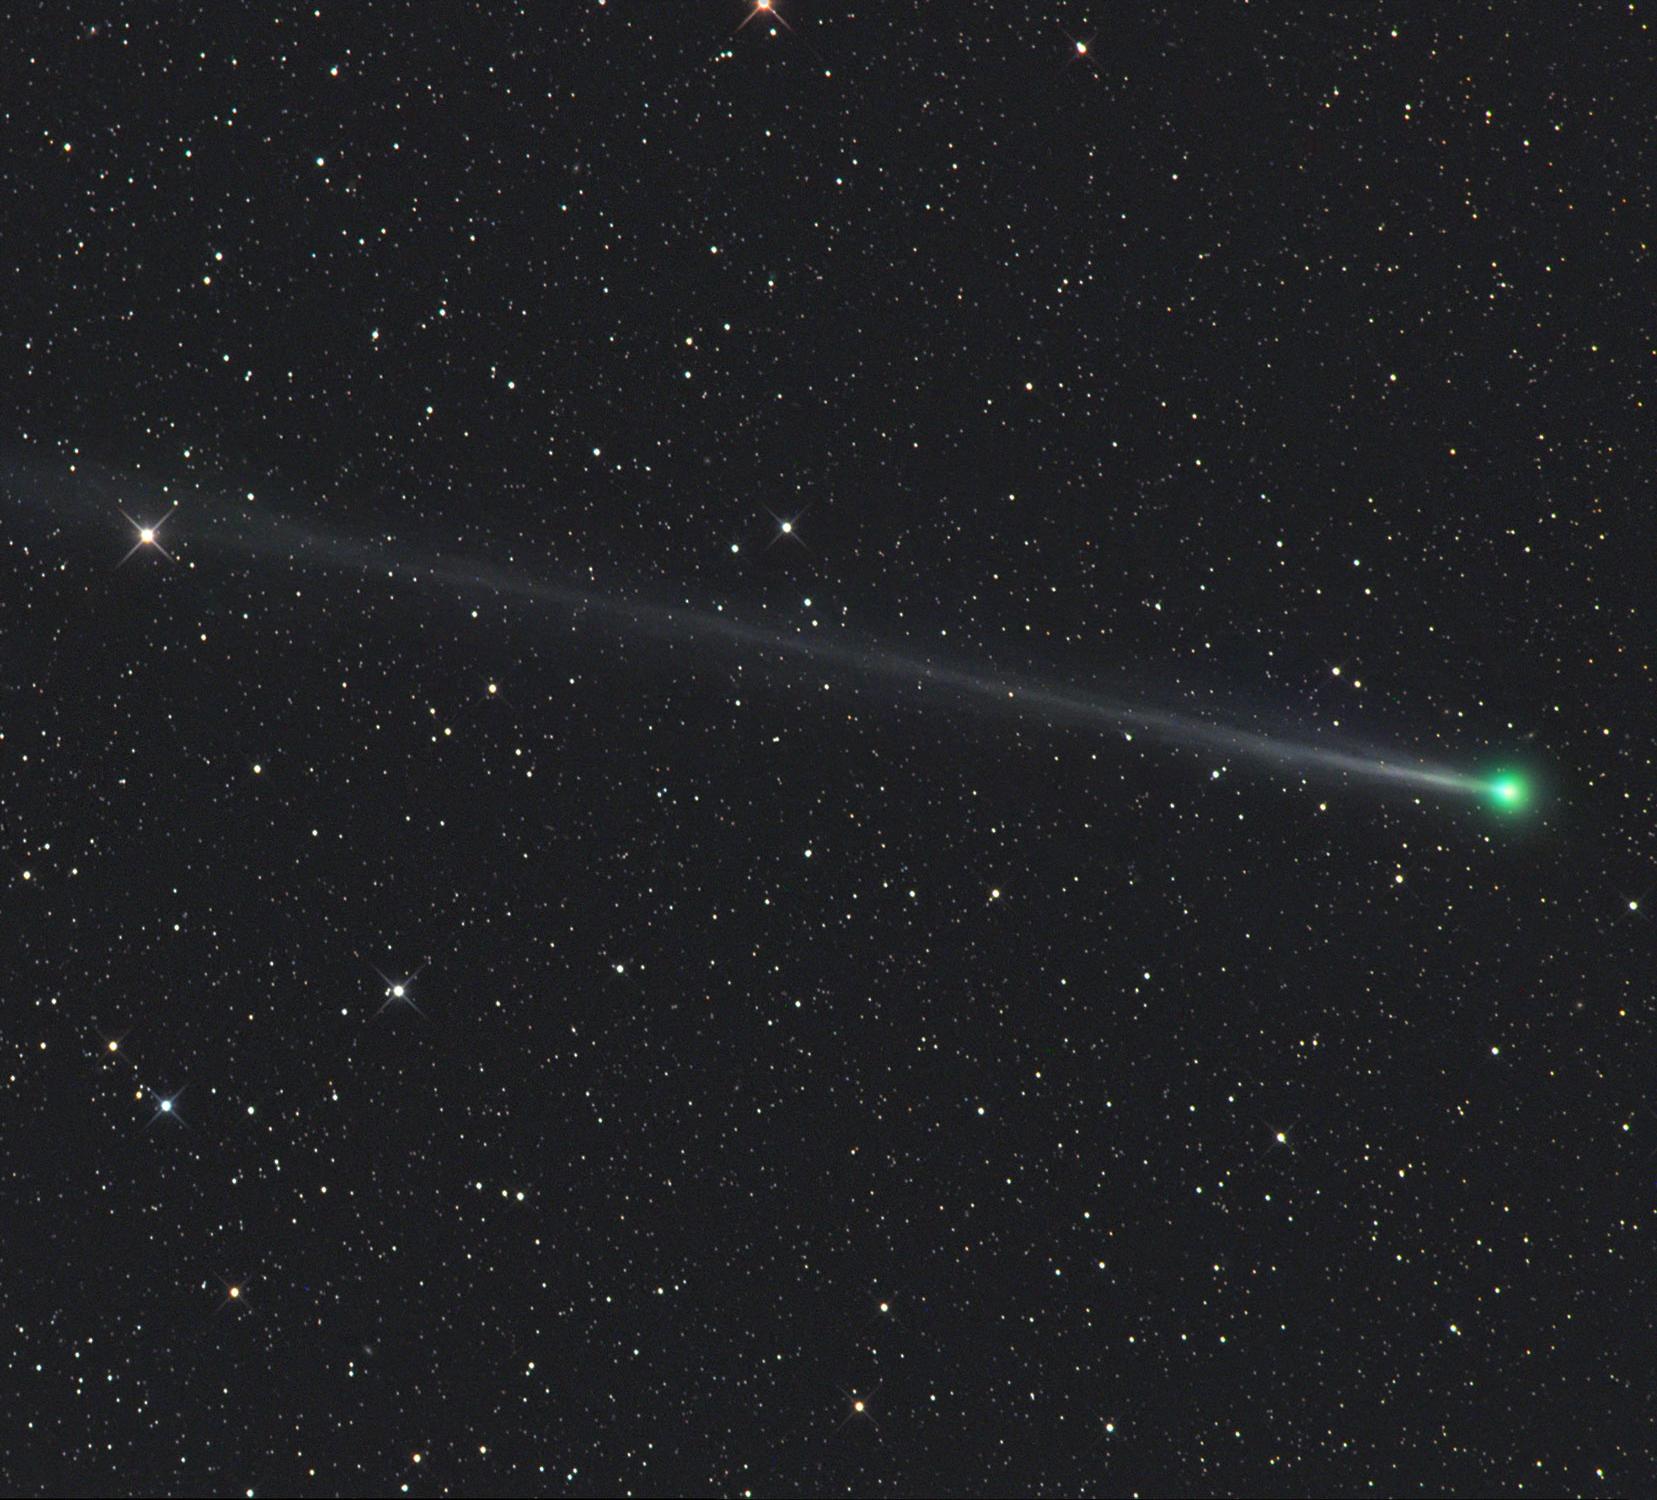 Comet 45P/Honda-Mrkos-Pajdušáková is captured using a telescope on December 22 from Farm Tivoli in Namibia, Africa. – Image Credit: Gerald Rhemann